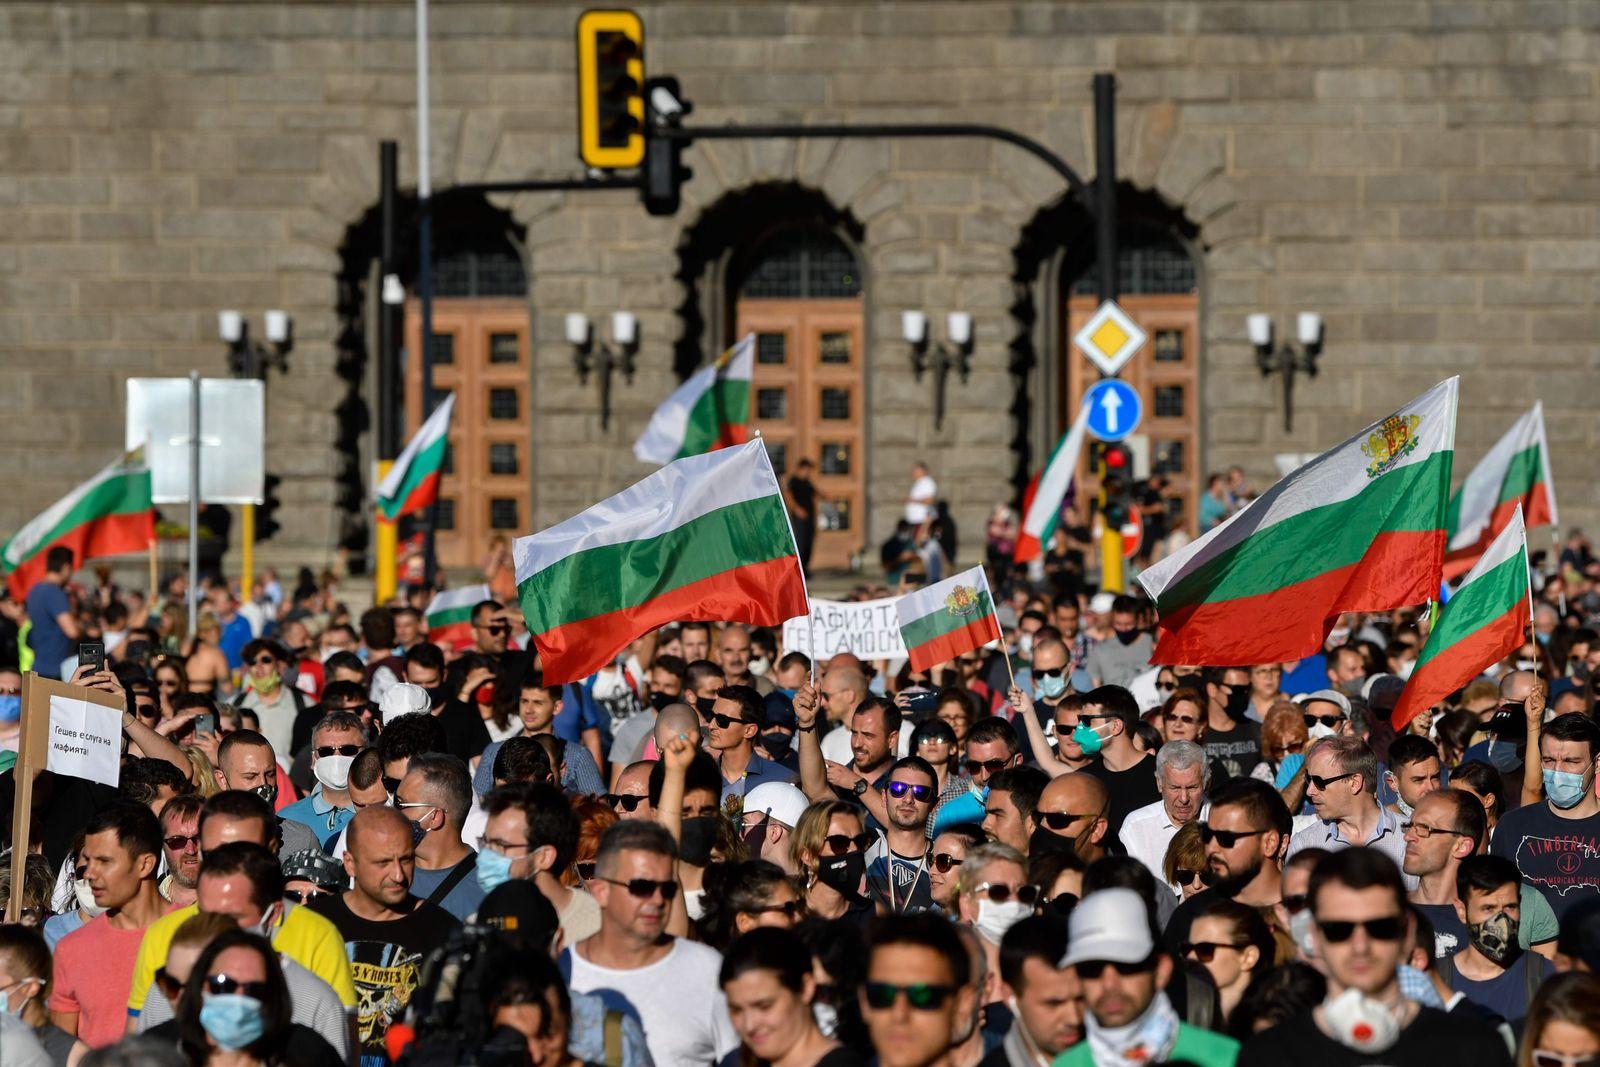 BULGARIA-POLITICS-DEMO